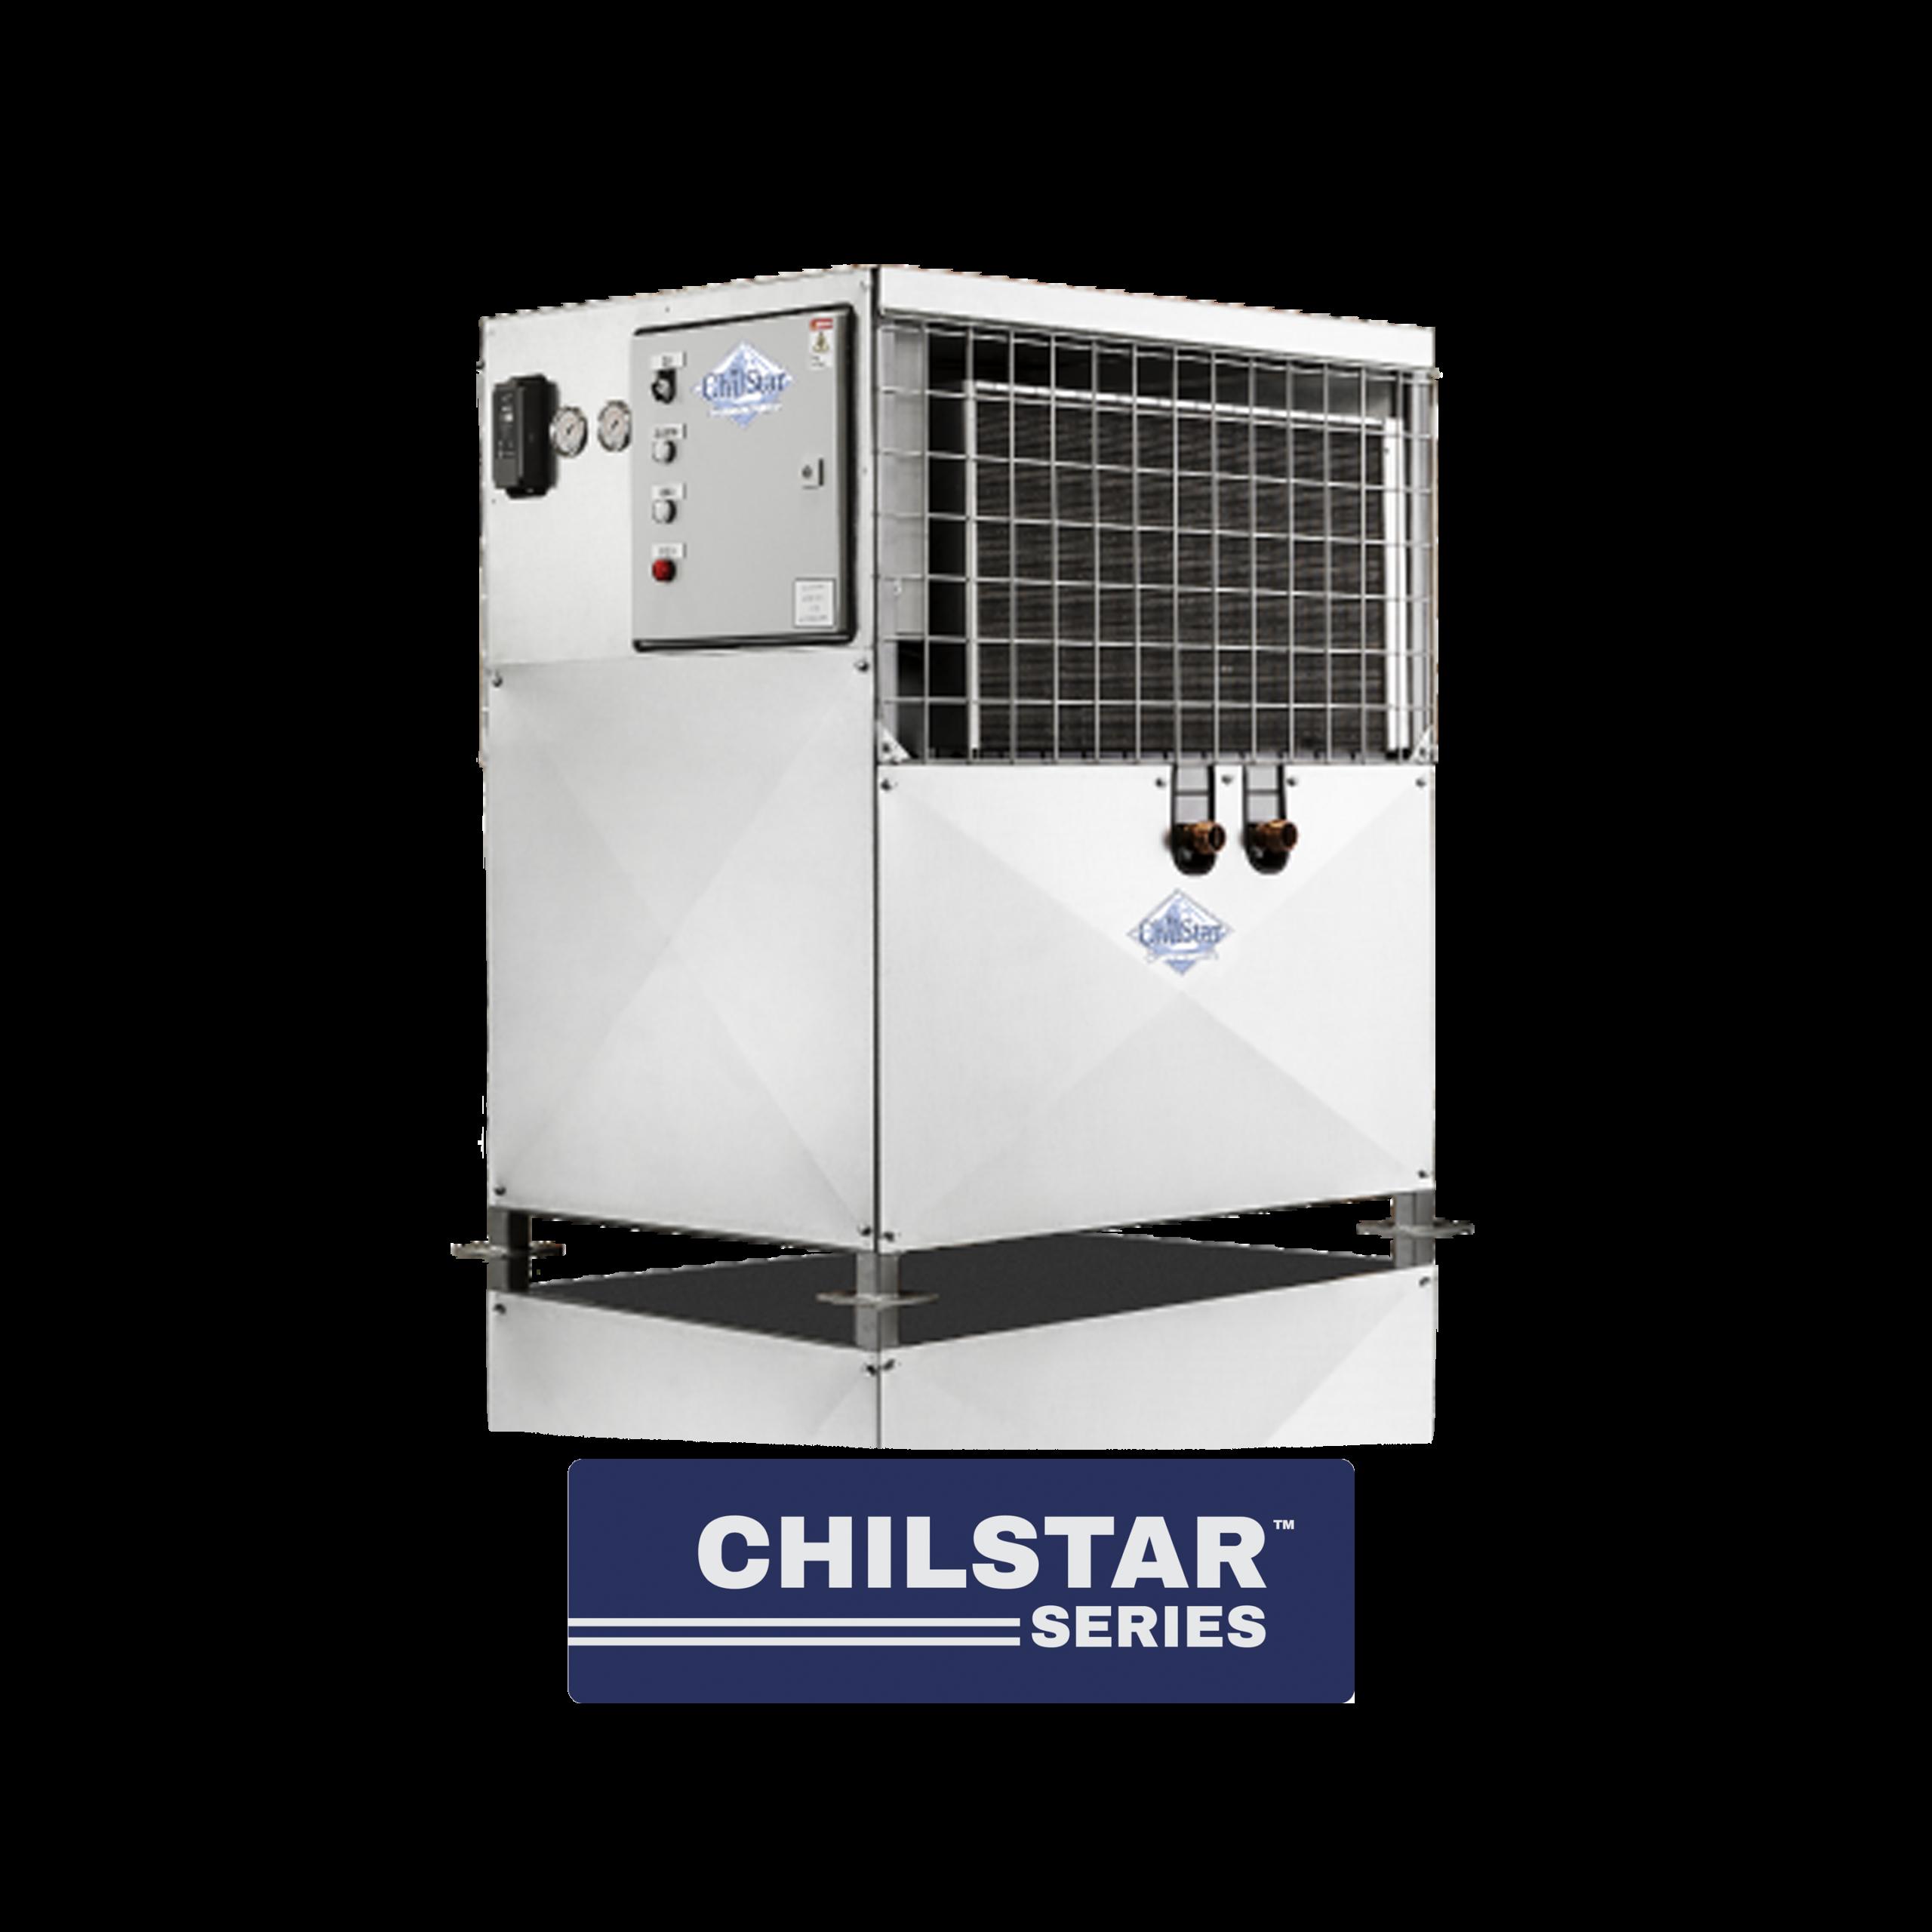 ChilStar Series